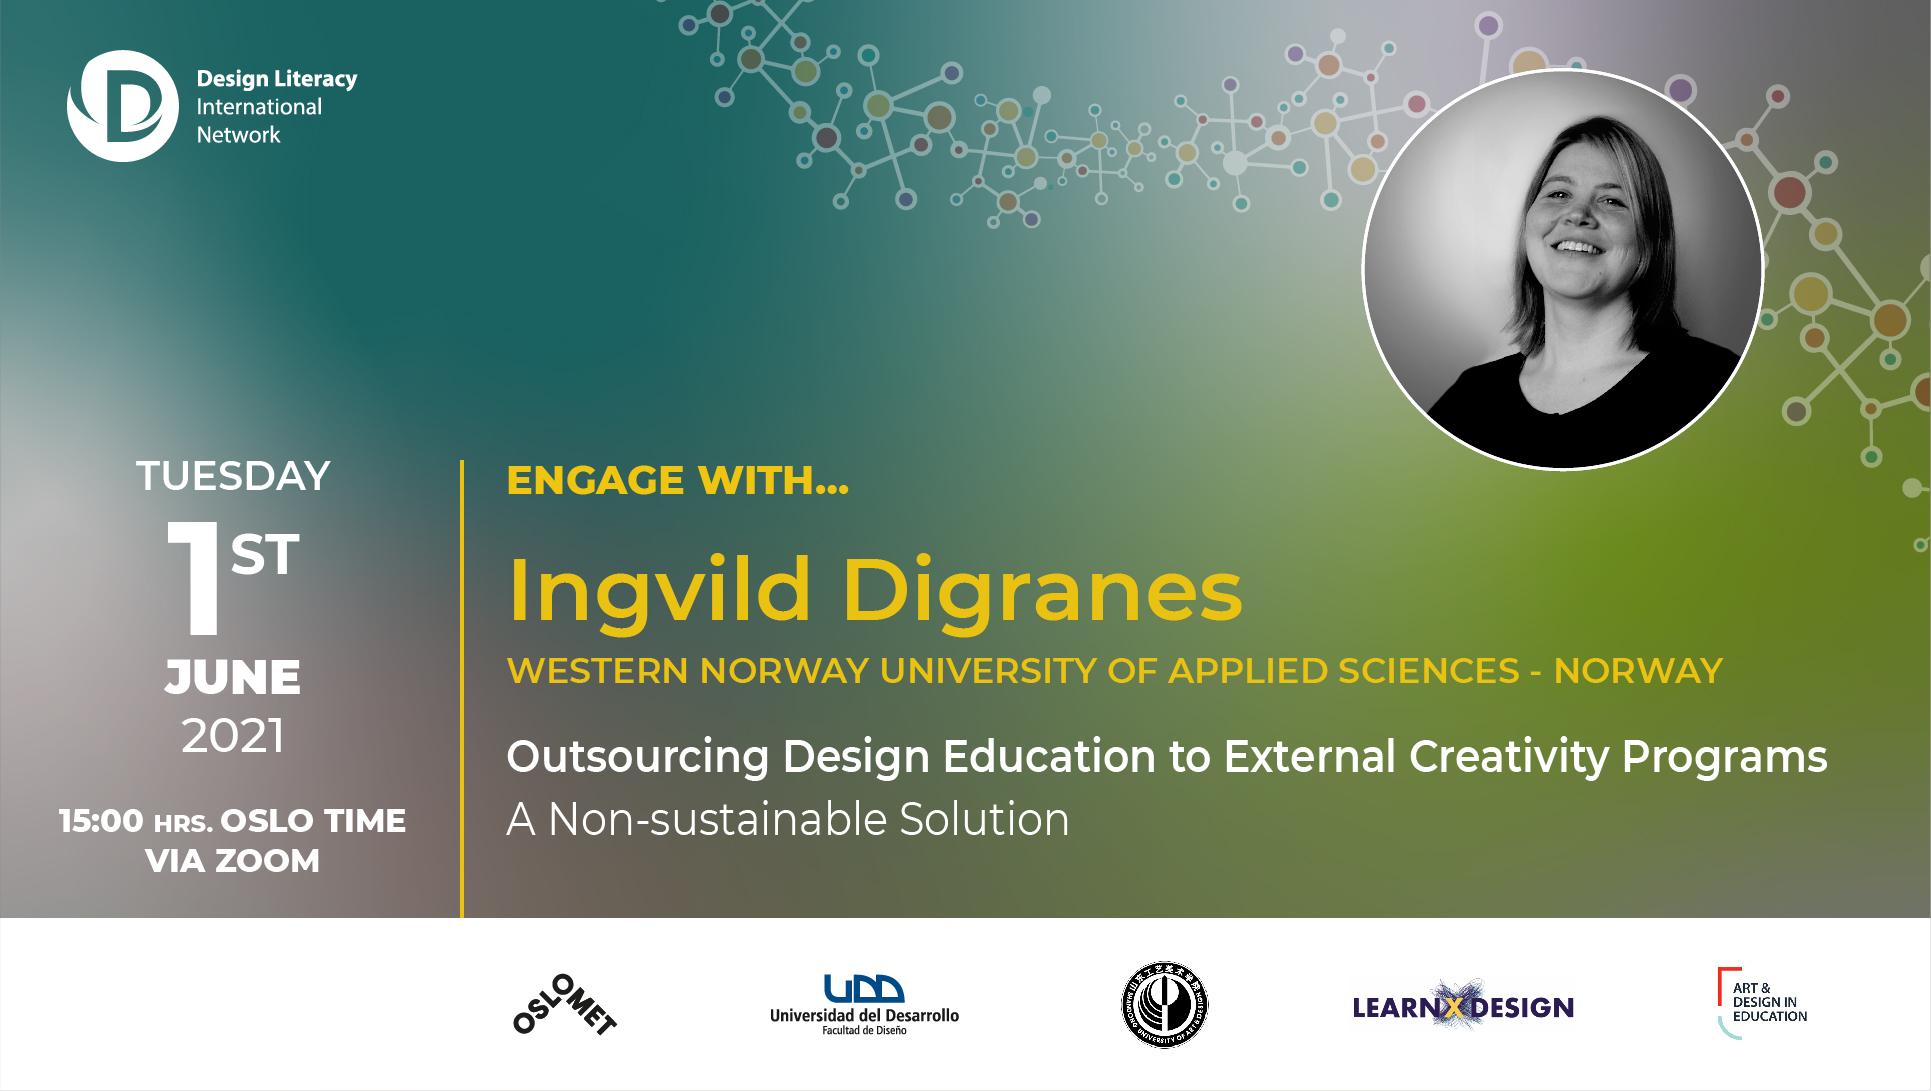 Engage with Ingvild Digranes | Design Literacy International Network event